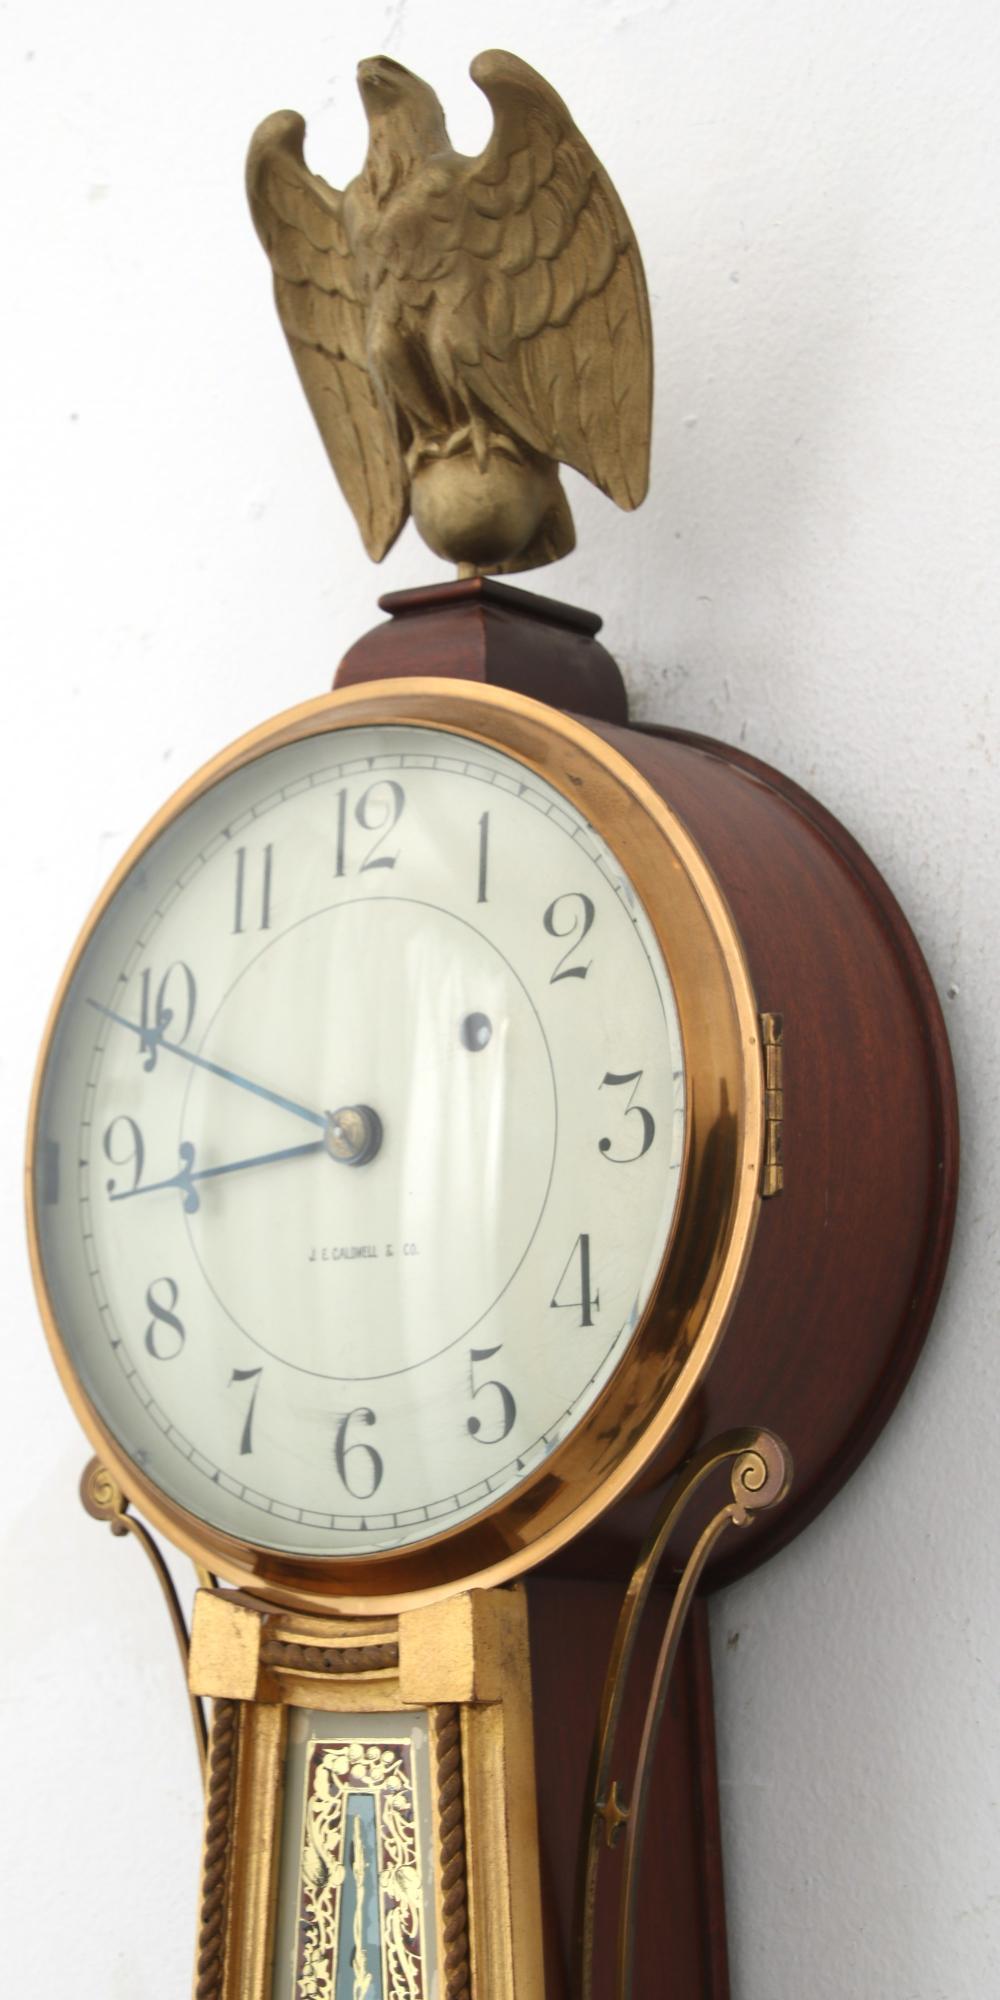 J.E. Caldwell Presentation Banjo Clock